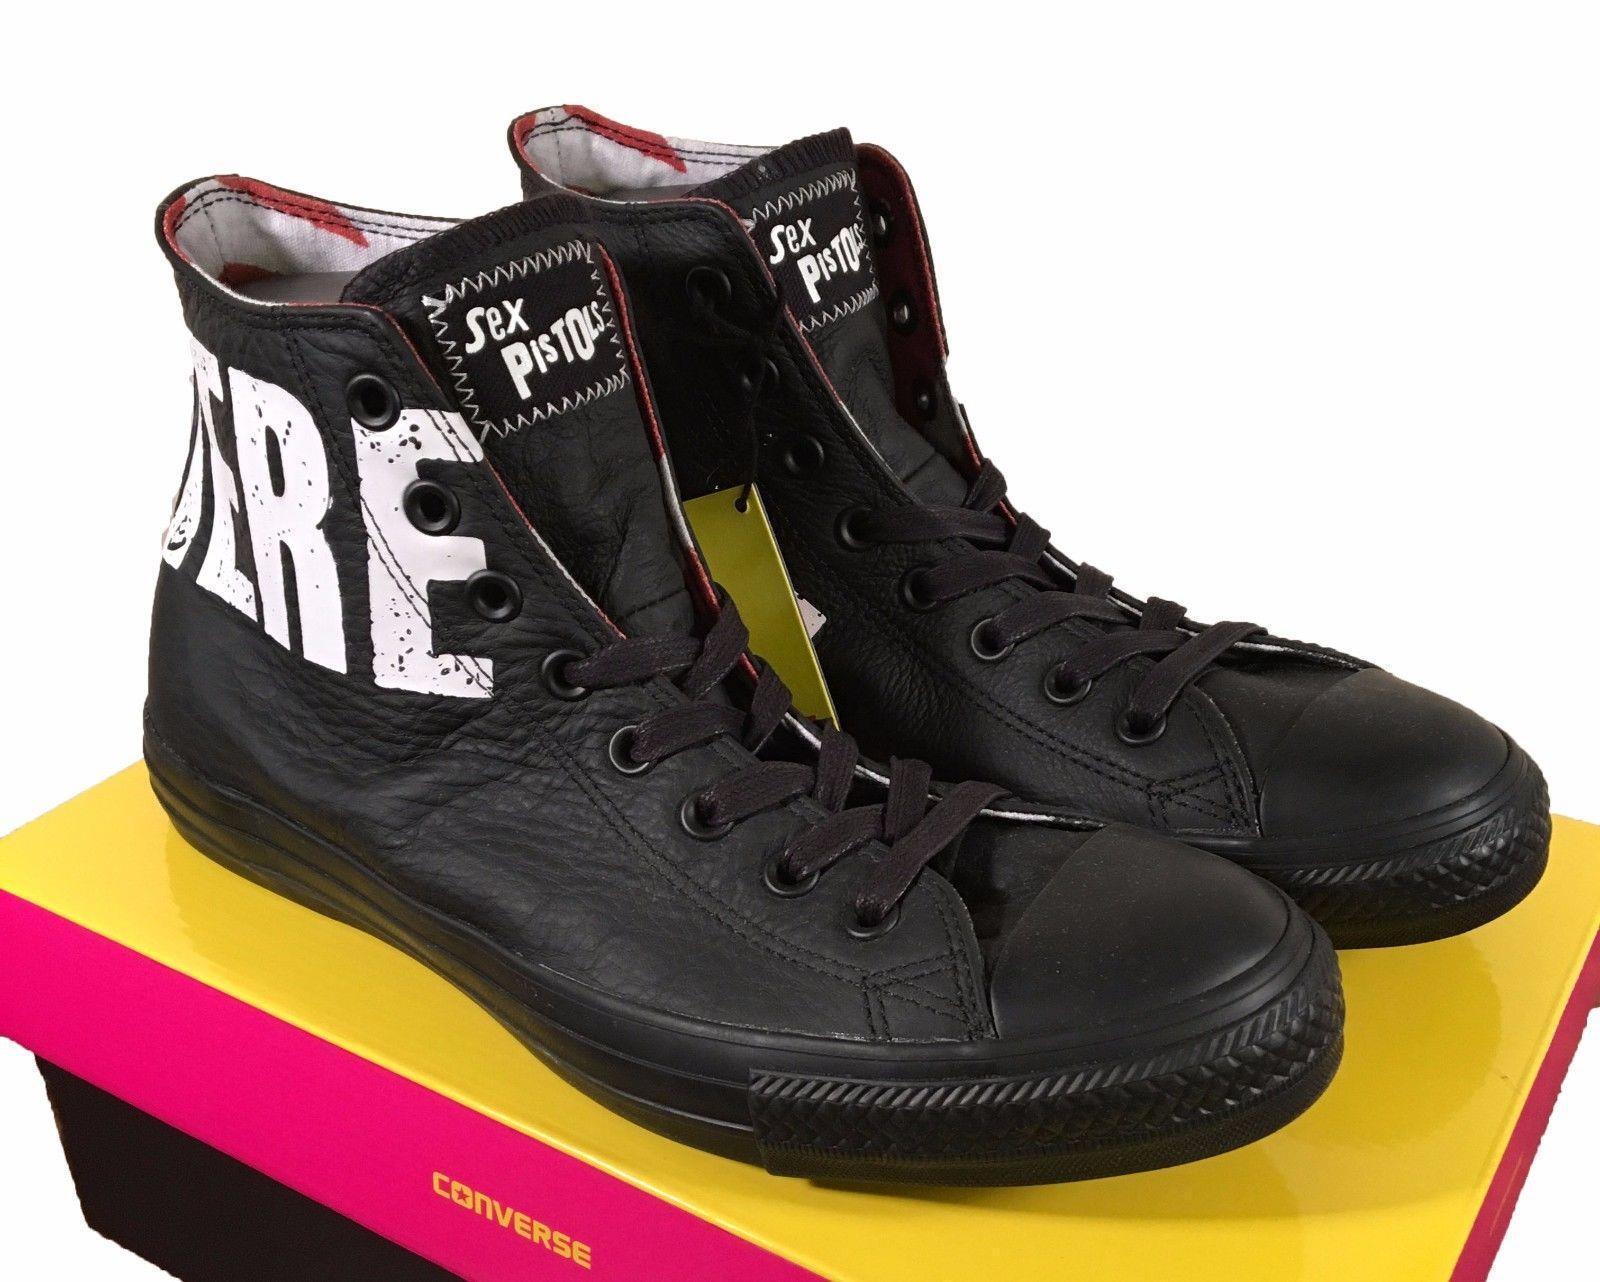 Converse Sex Pistols Chuck Taylor All Star Black Leather Sneaker NOWHERE BOREDOM